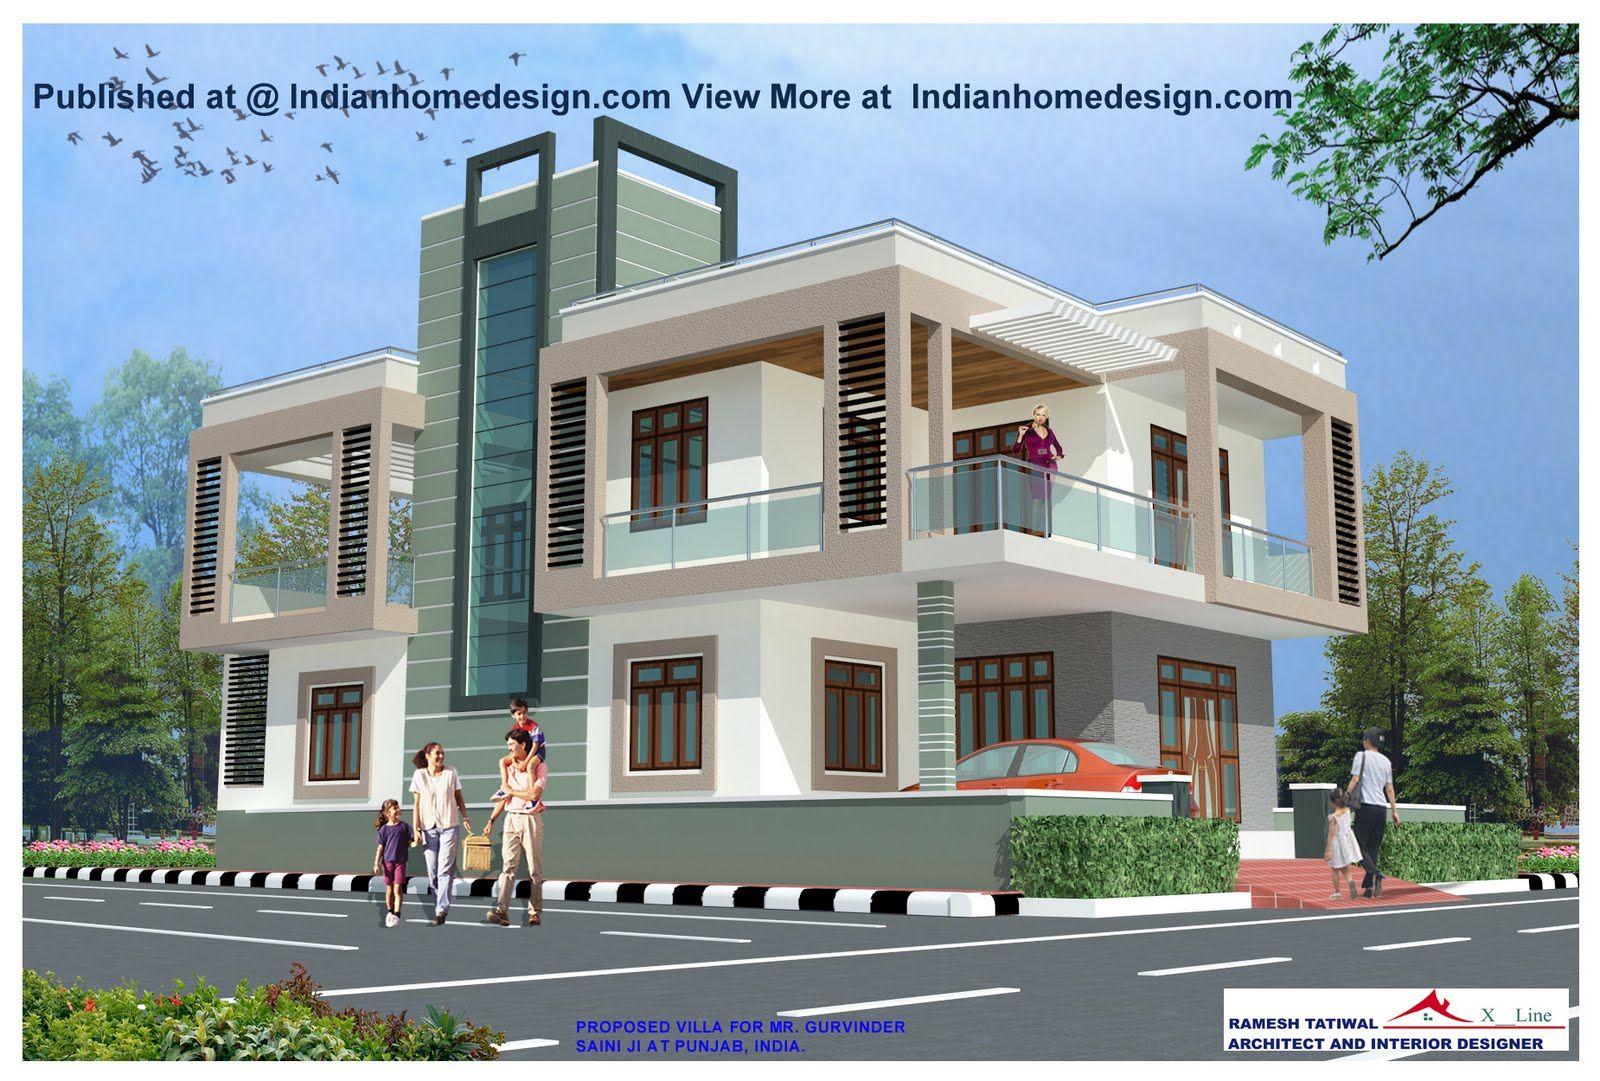 modern exteriors  Villas design rajasthan style home exterior home design villas design